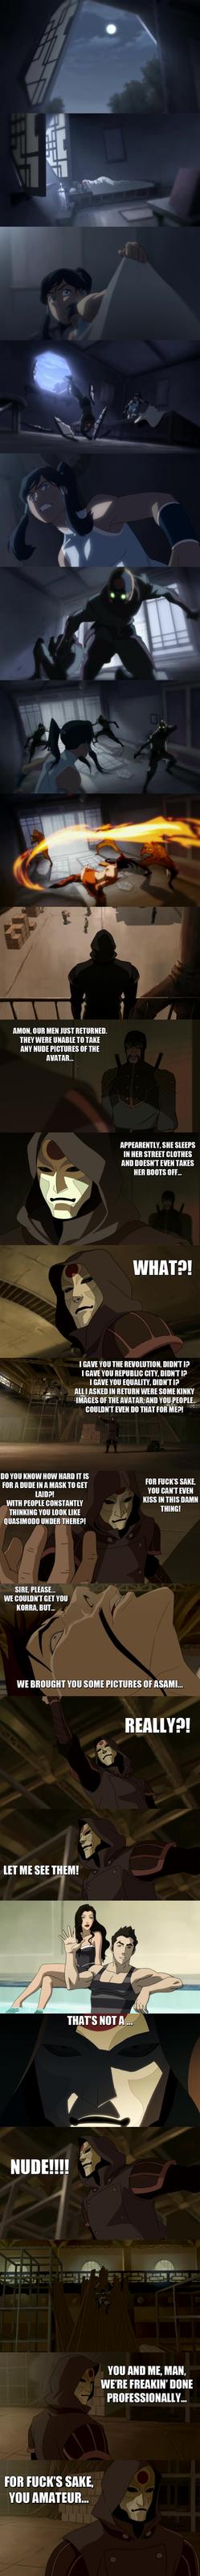 Legend of Korra - Amon is desperate... by yourparodies